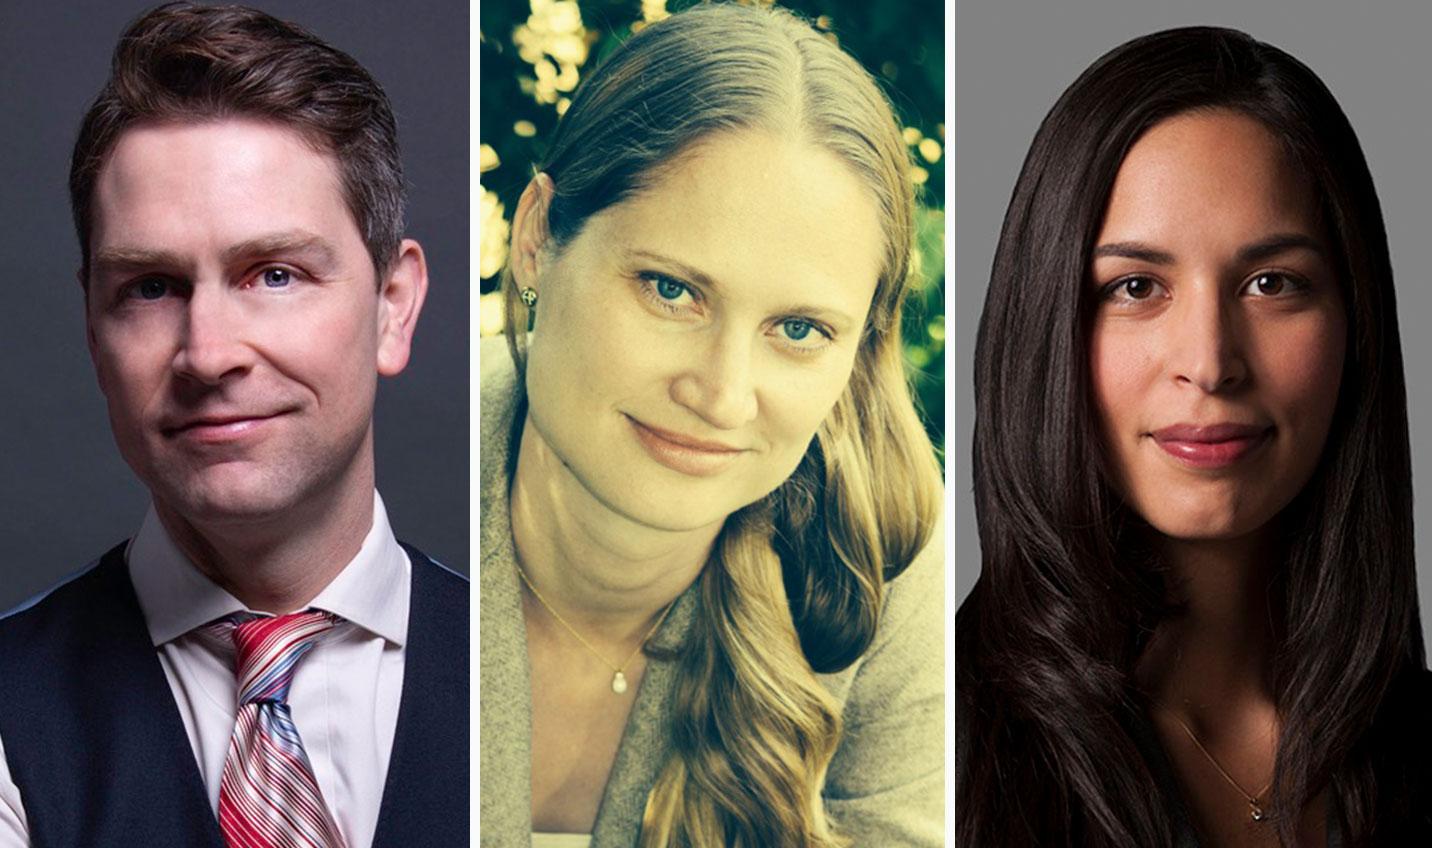 Will Amos, Jen Kalnins, and Julia Croome